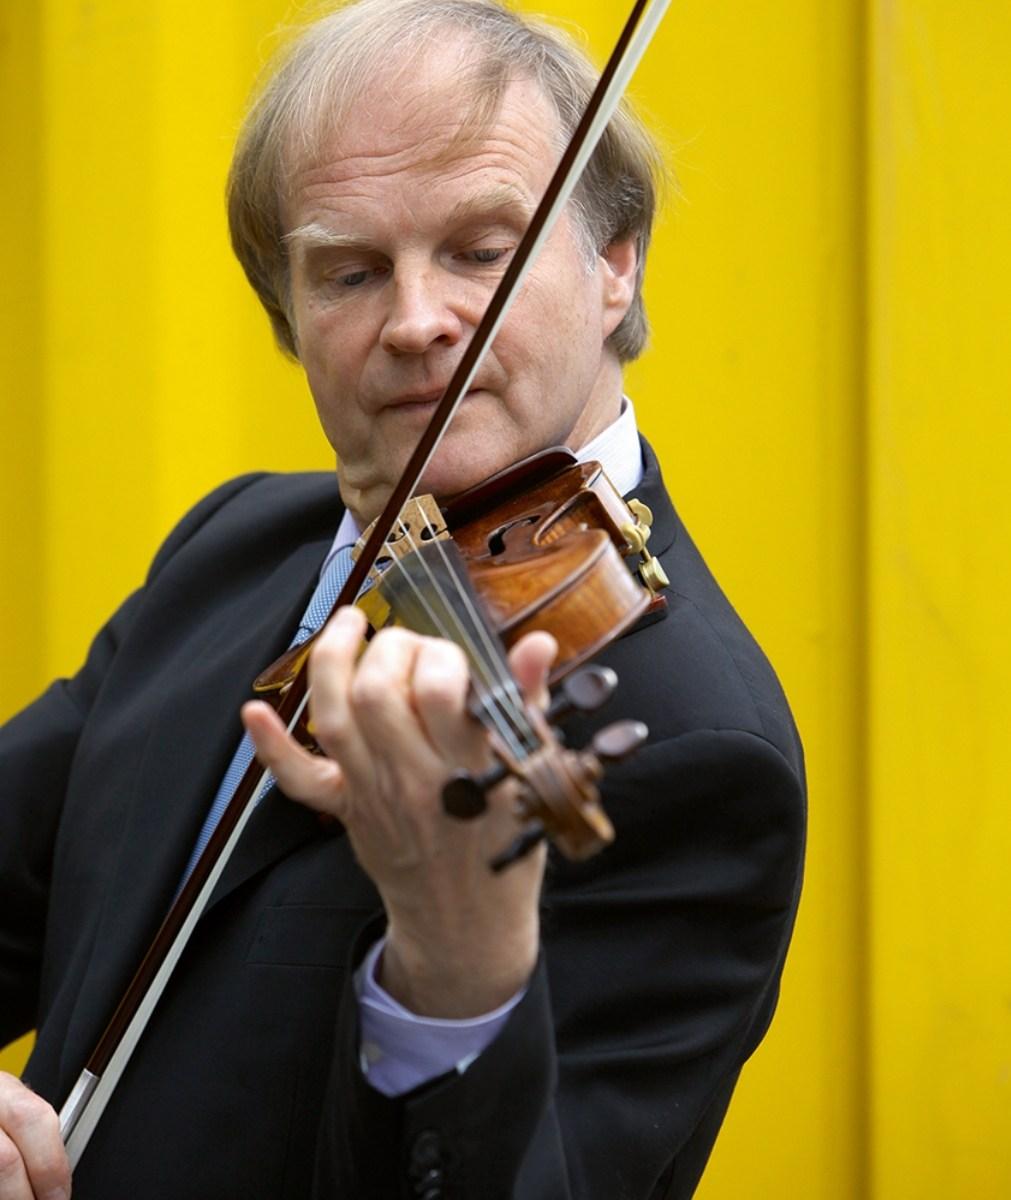 Alexandre-Dubach-violon